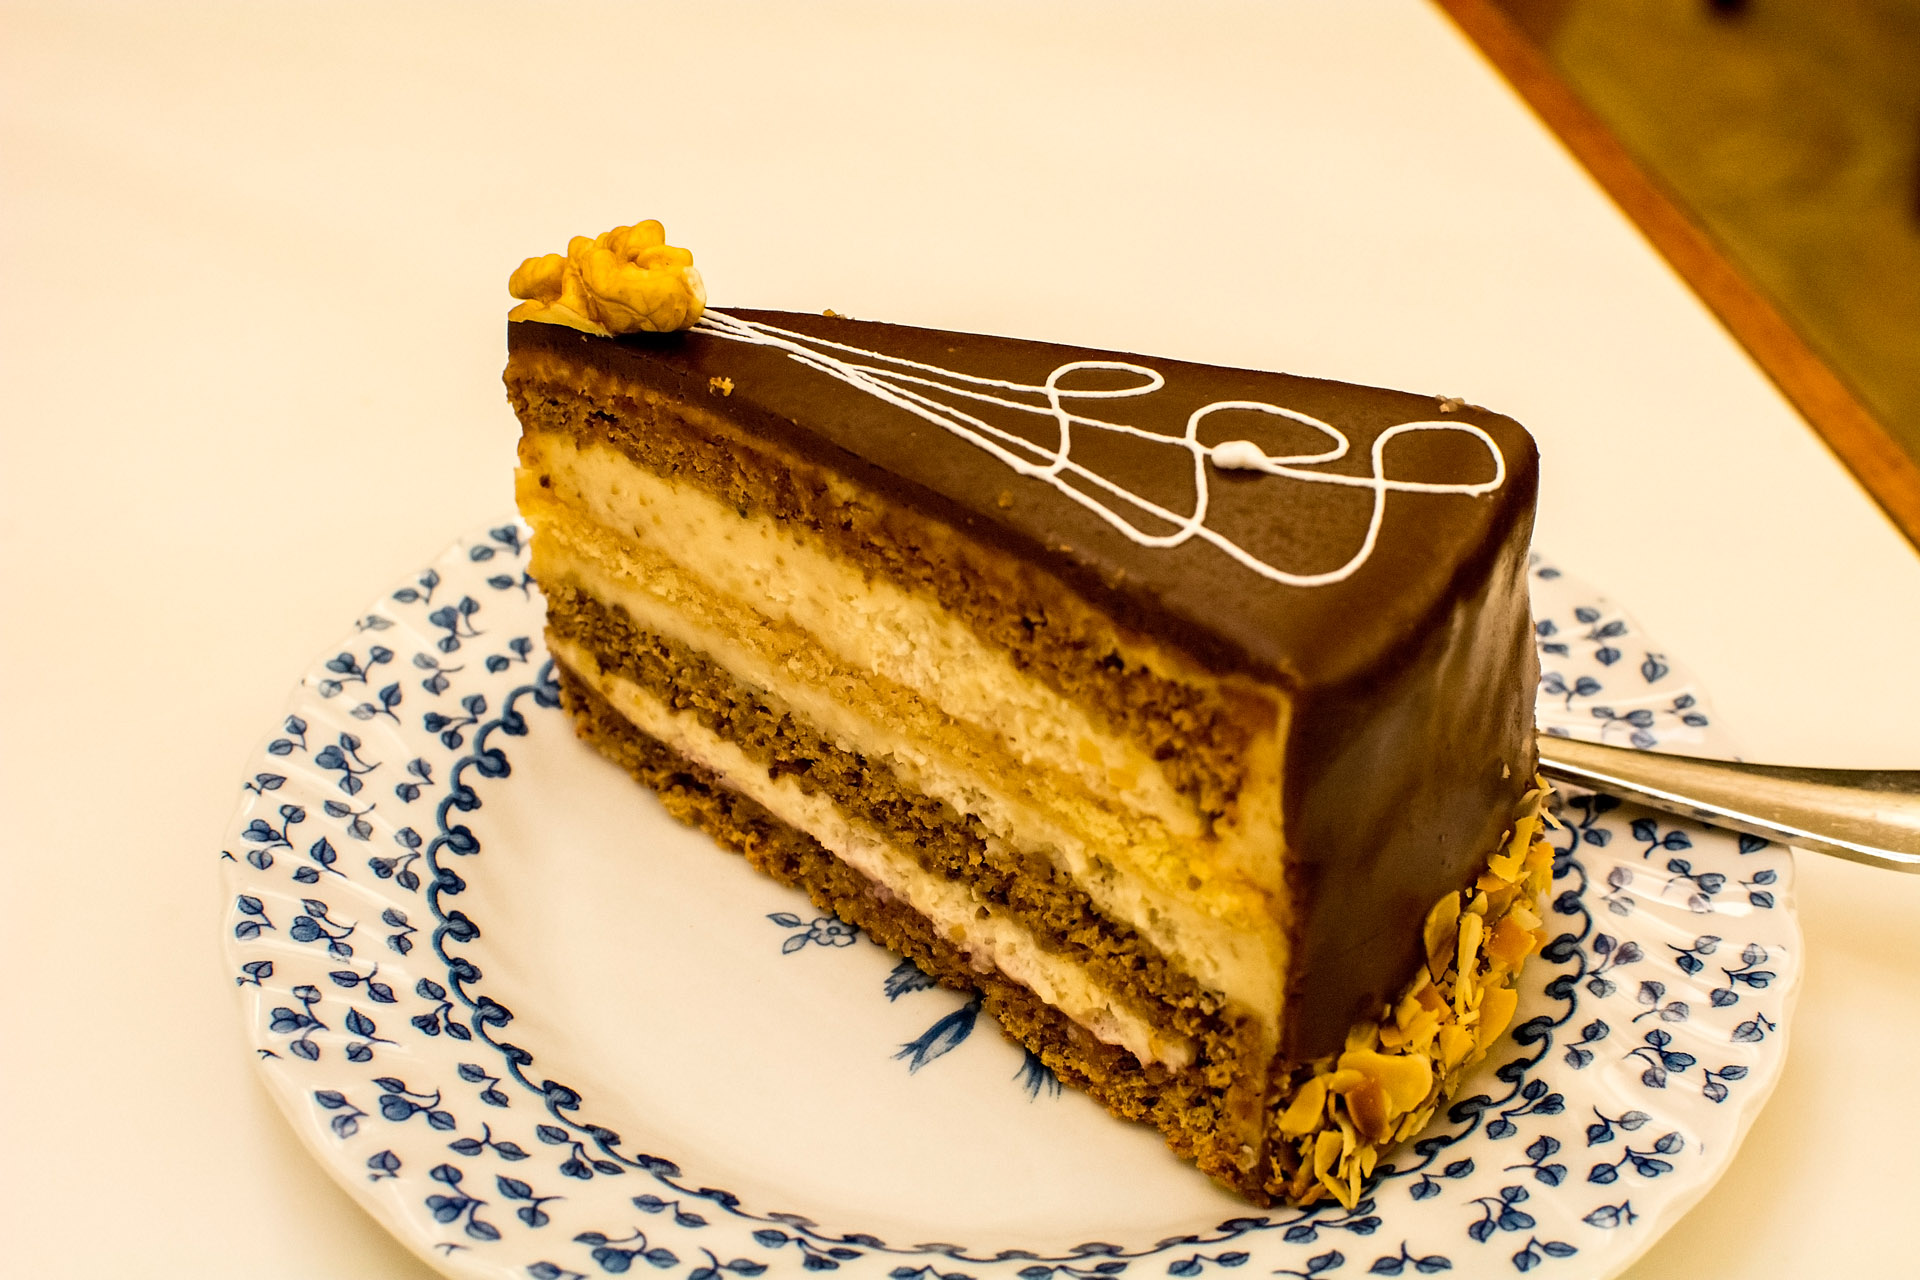 Walnusstorte (walnut torte)